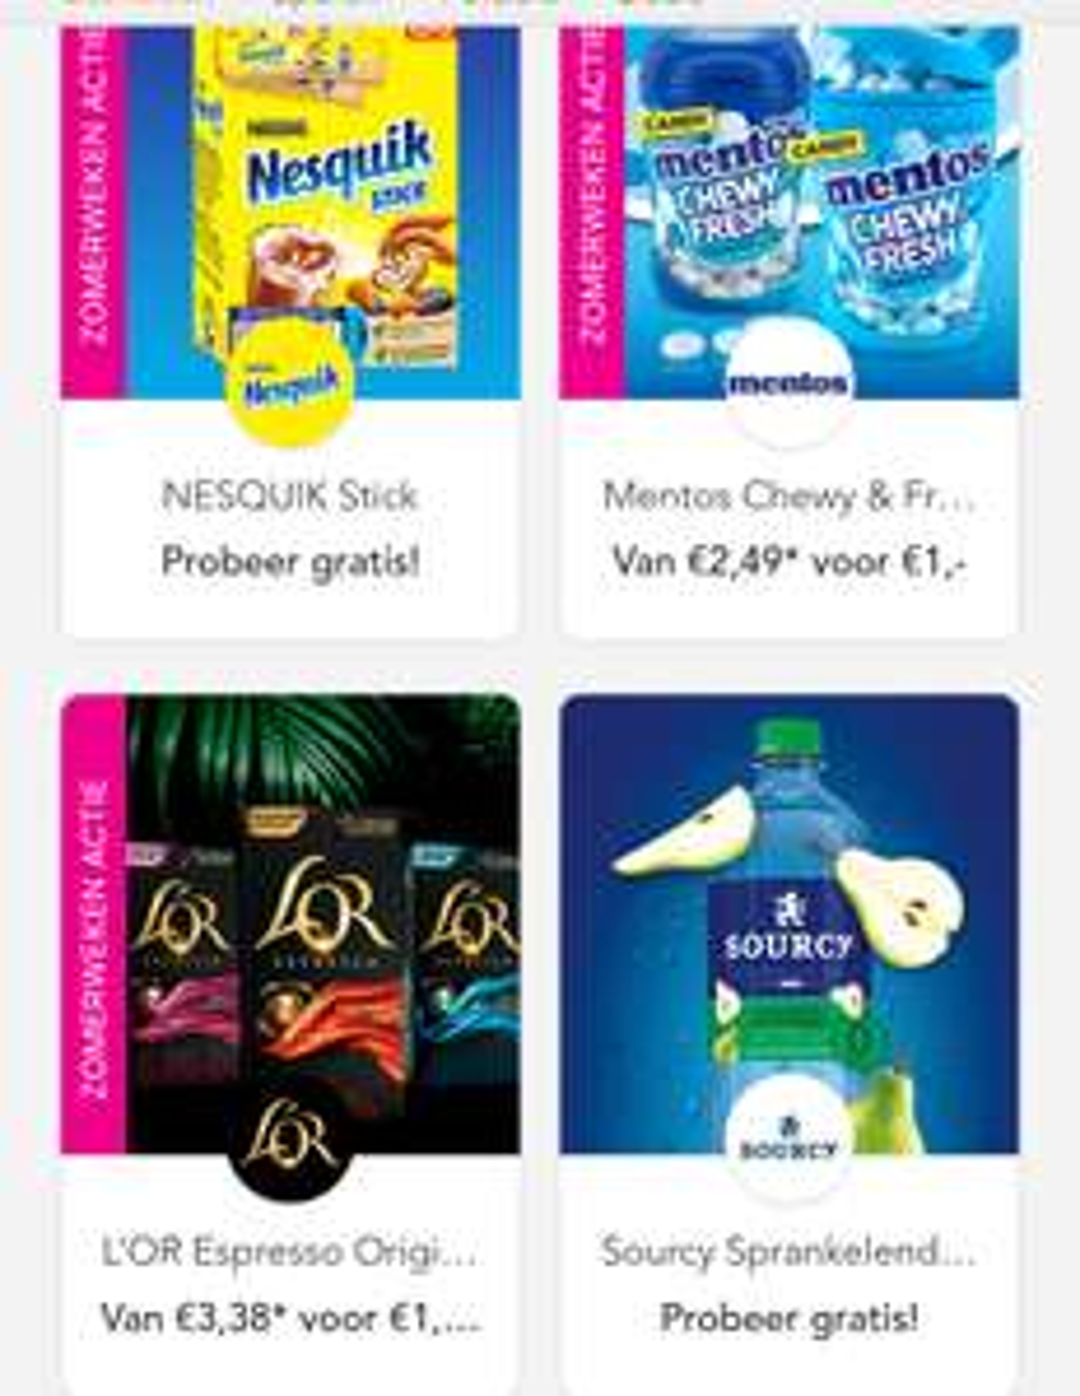 Scoupy cashback: gratis Sourcy, gratis Nesquick, Babybel snack €0,50